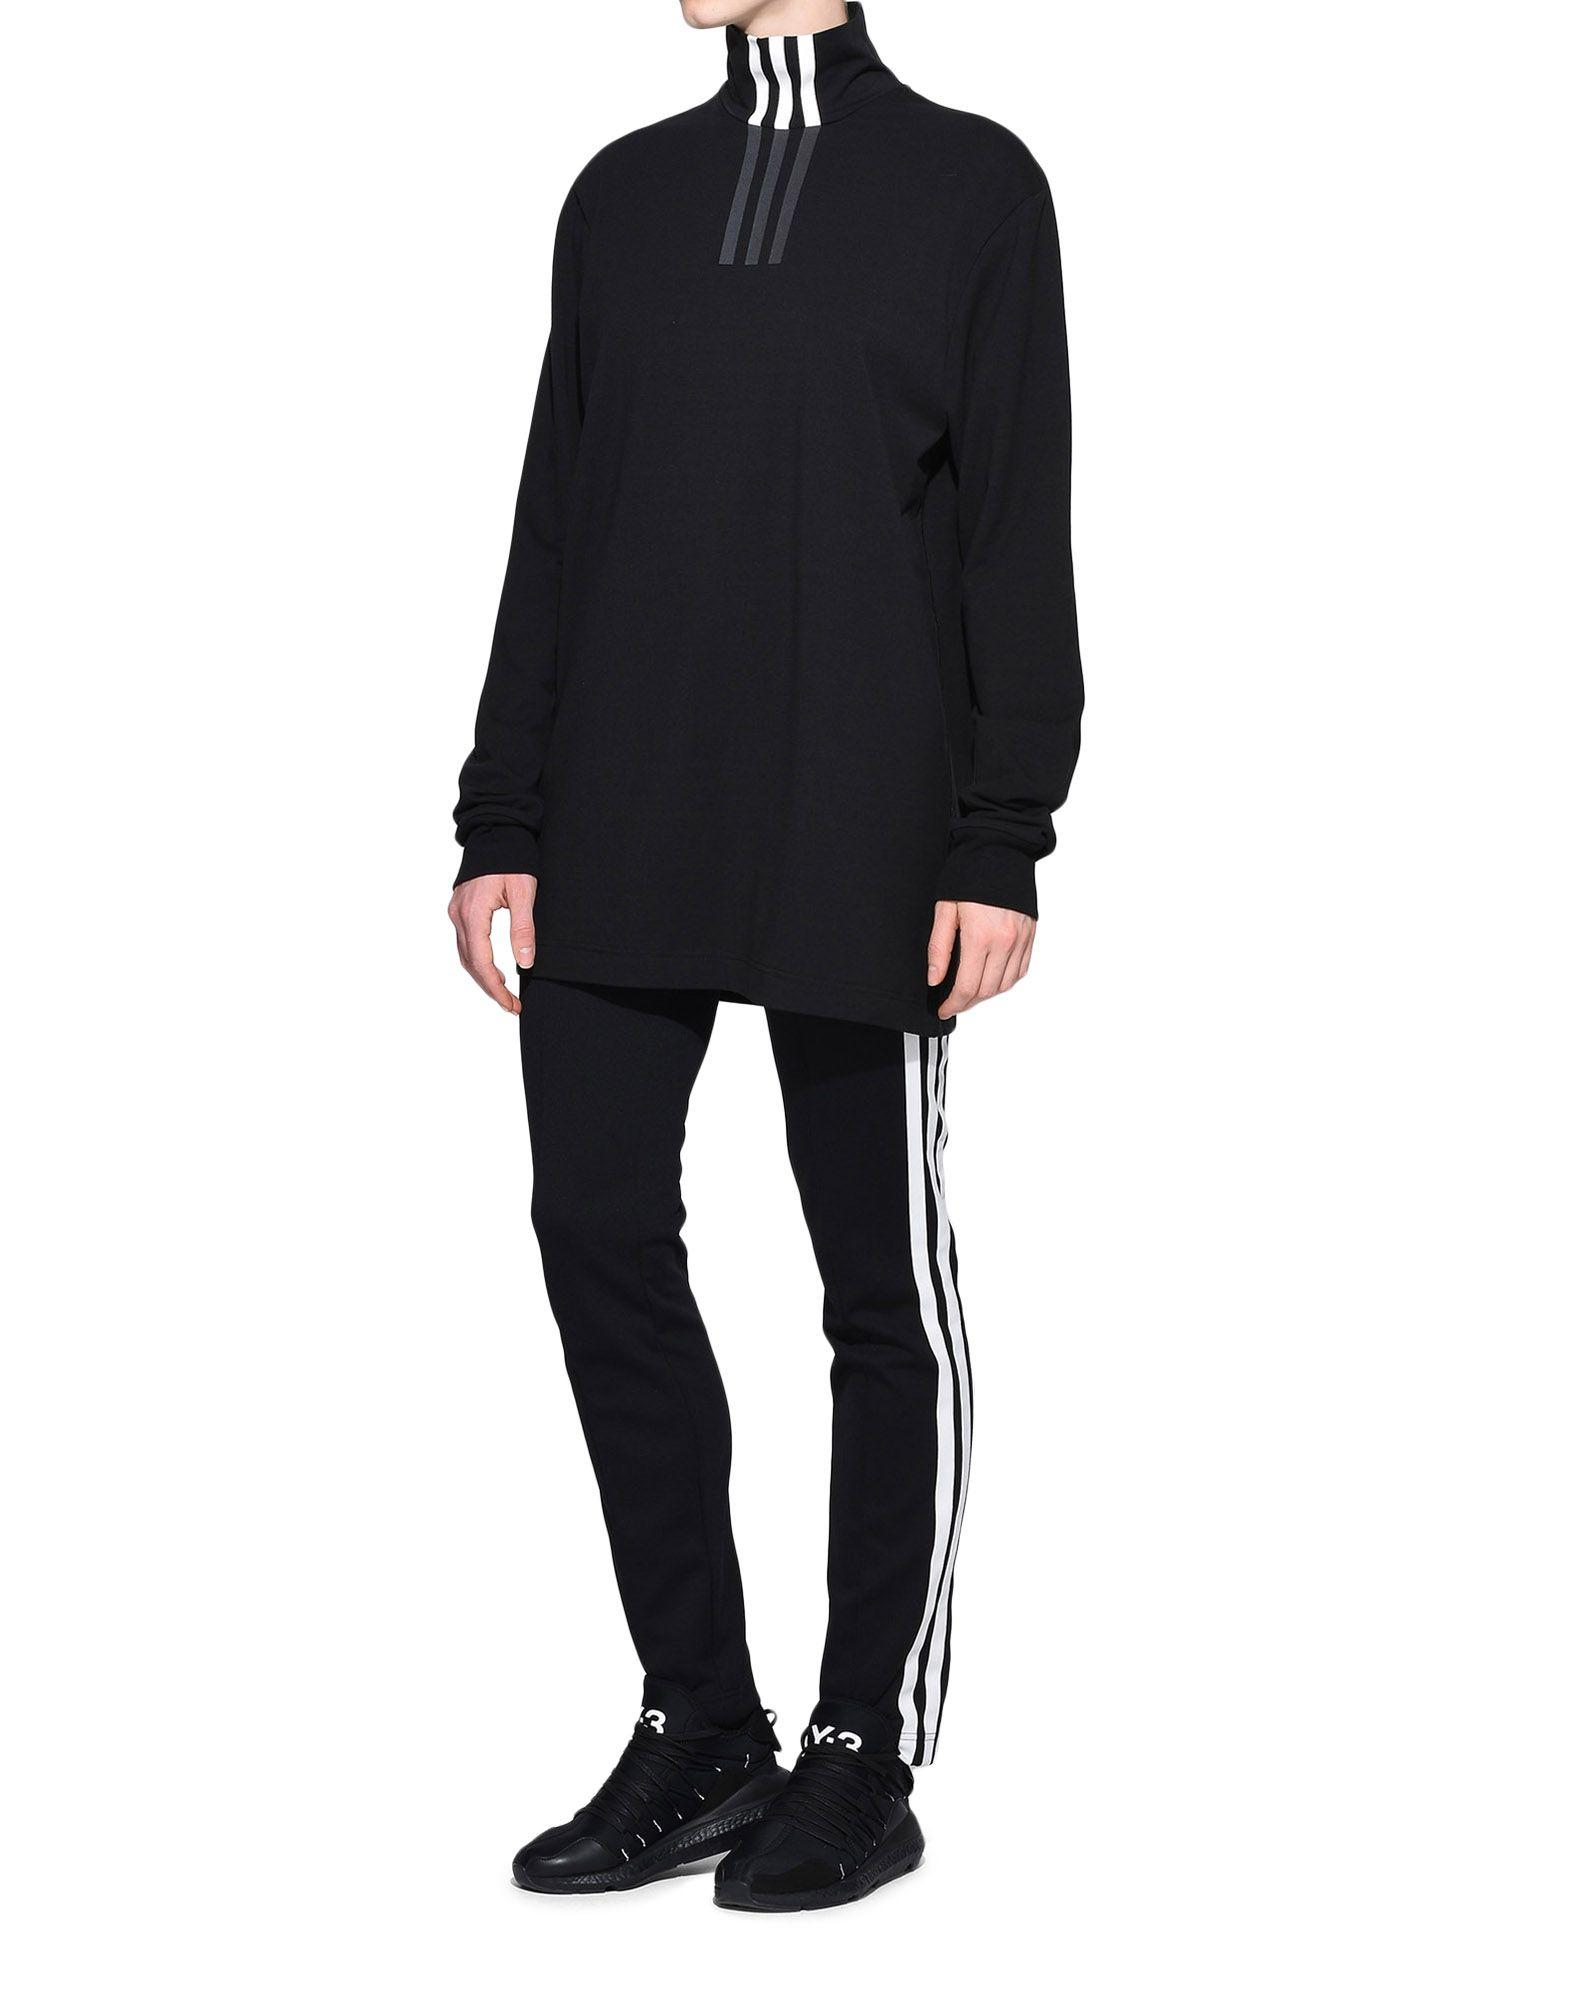 Y-3 Y-3 3-Stripes High Neck Tee Long sleeve t-shirt Woman a